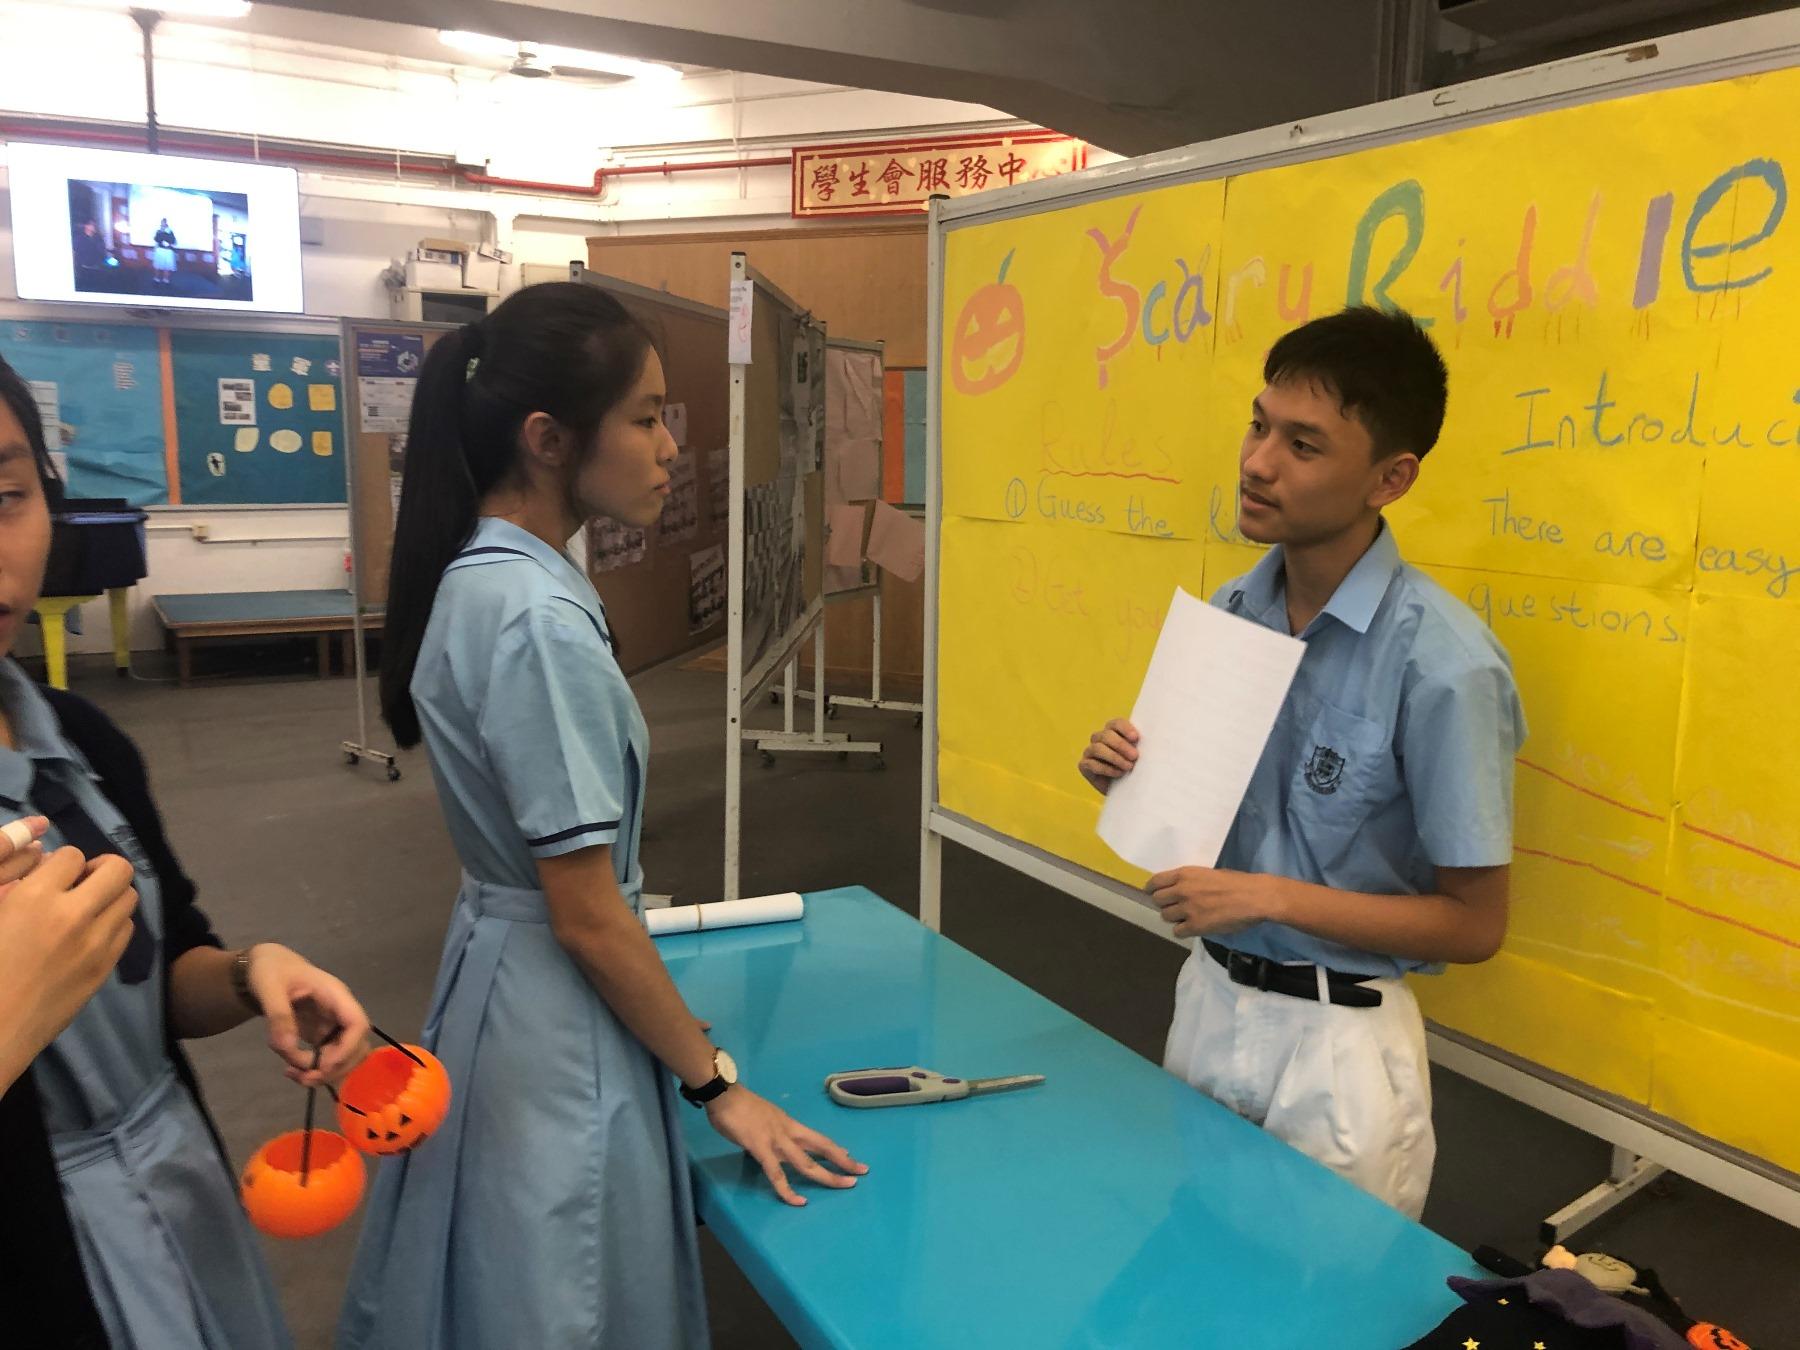 http://npc.edu.hk/sites/default/files/img_7996.jpg